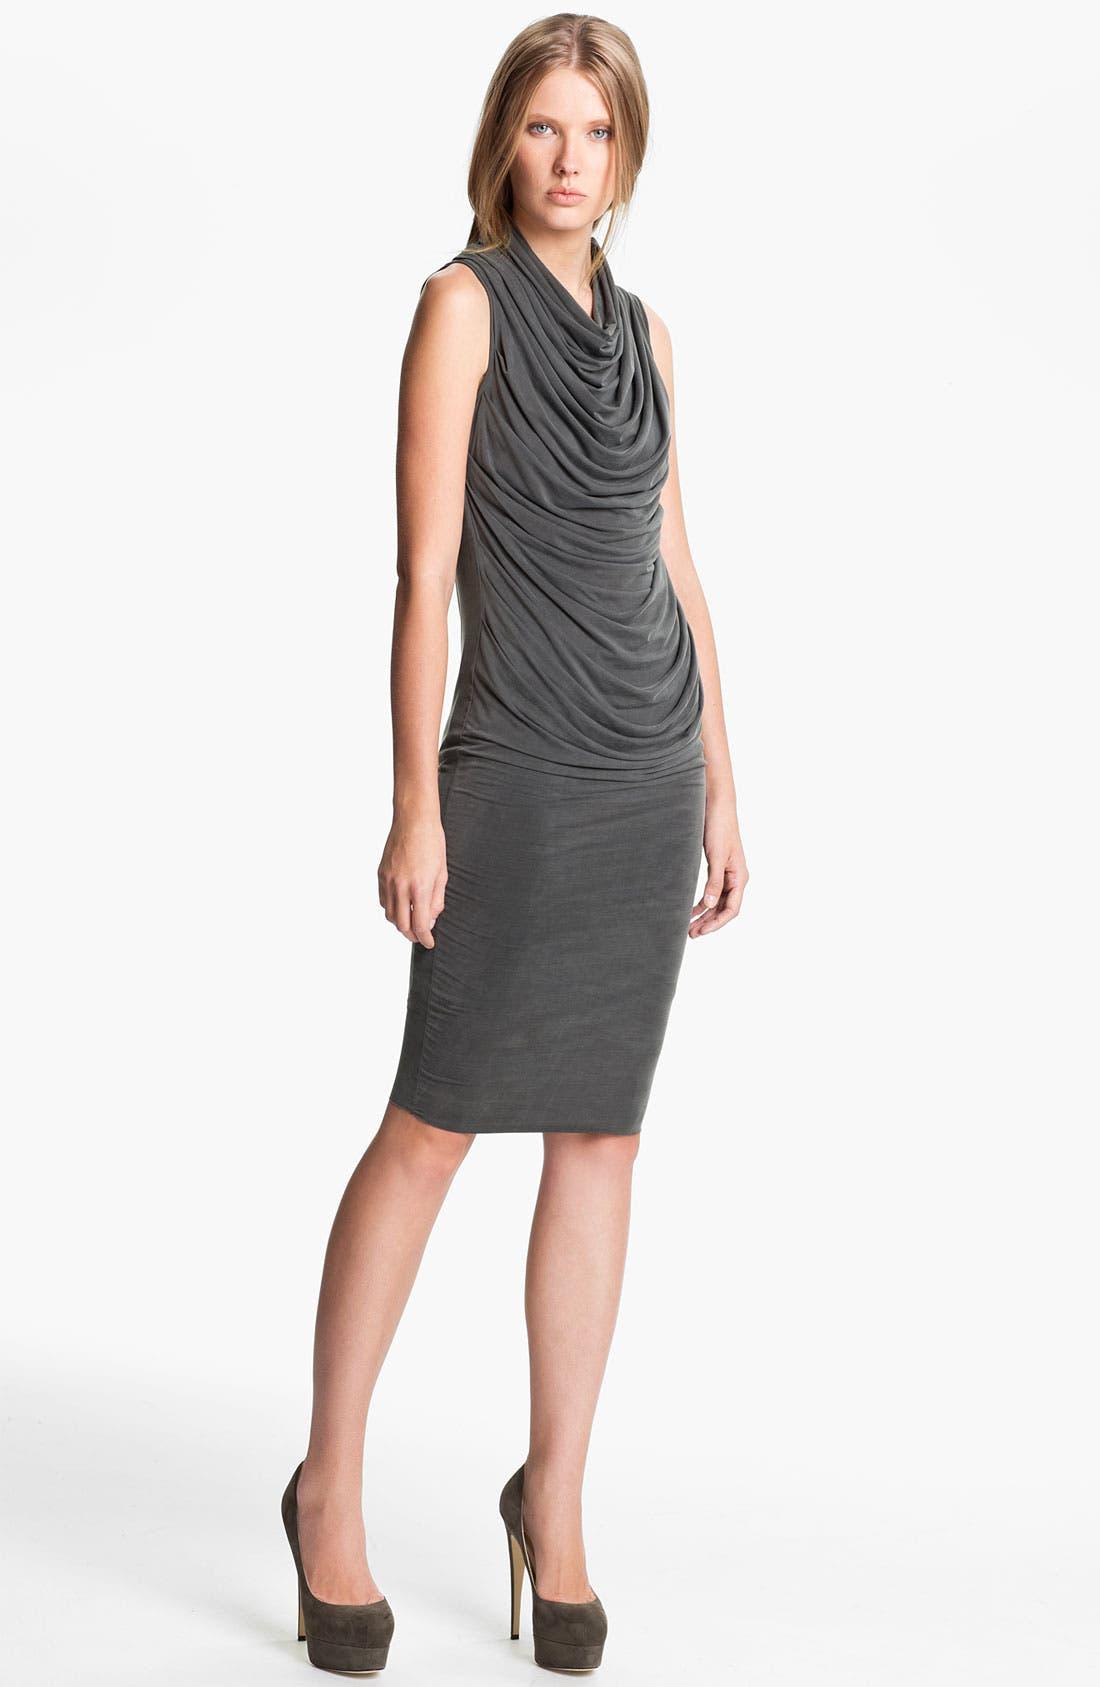 Alternate Image 1 Selected - Helmut Lang 'Shade' Sleeveless Draped Dress